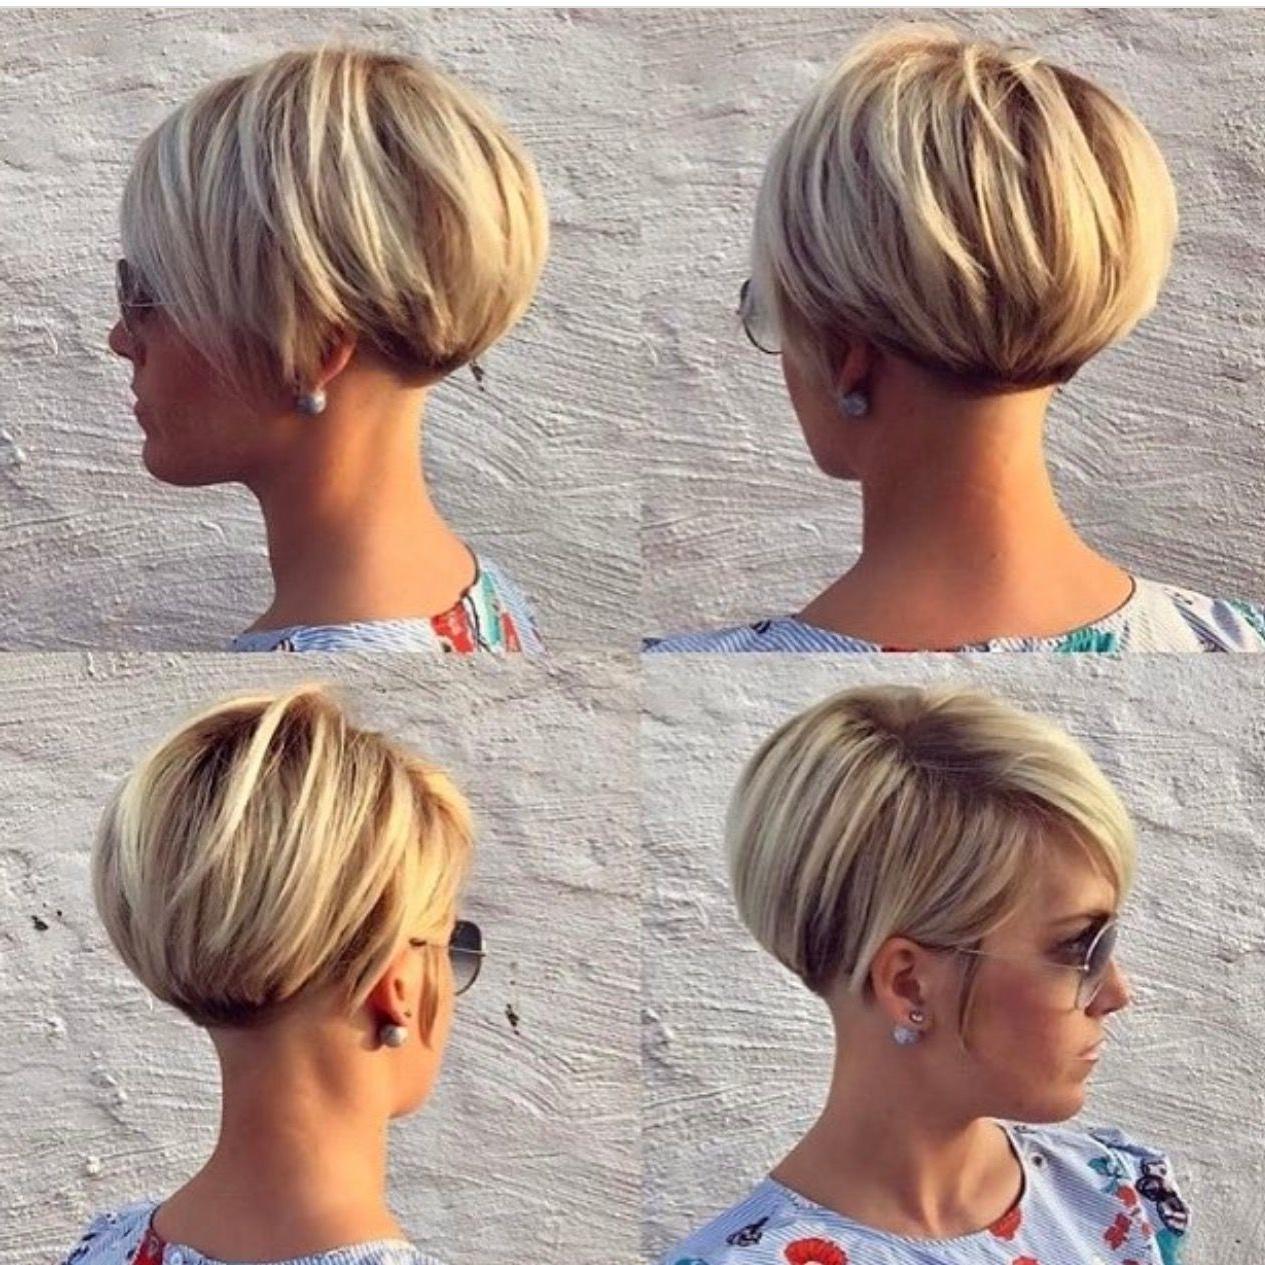 15 The Best Pixie Bob Haircuts